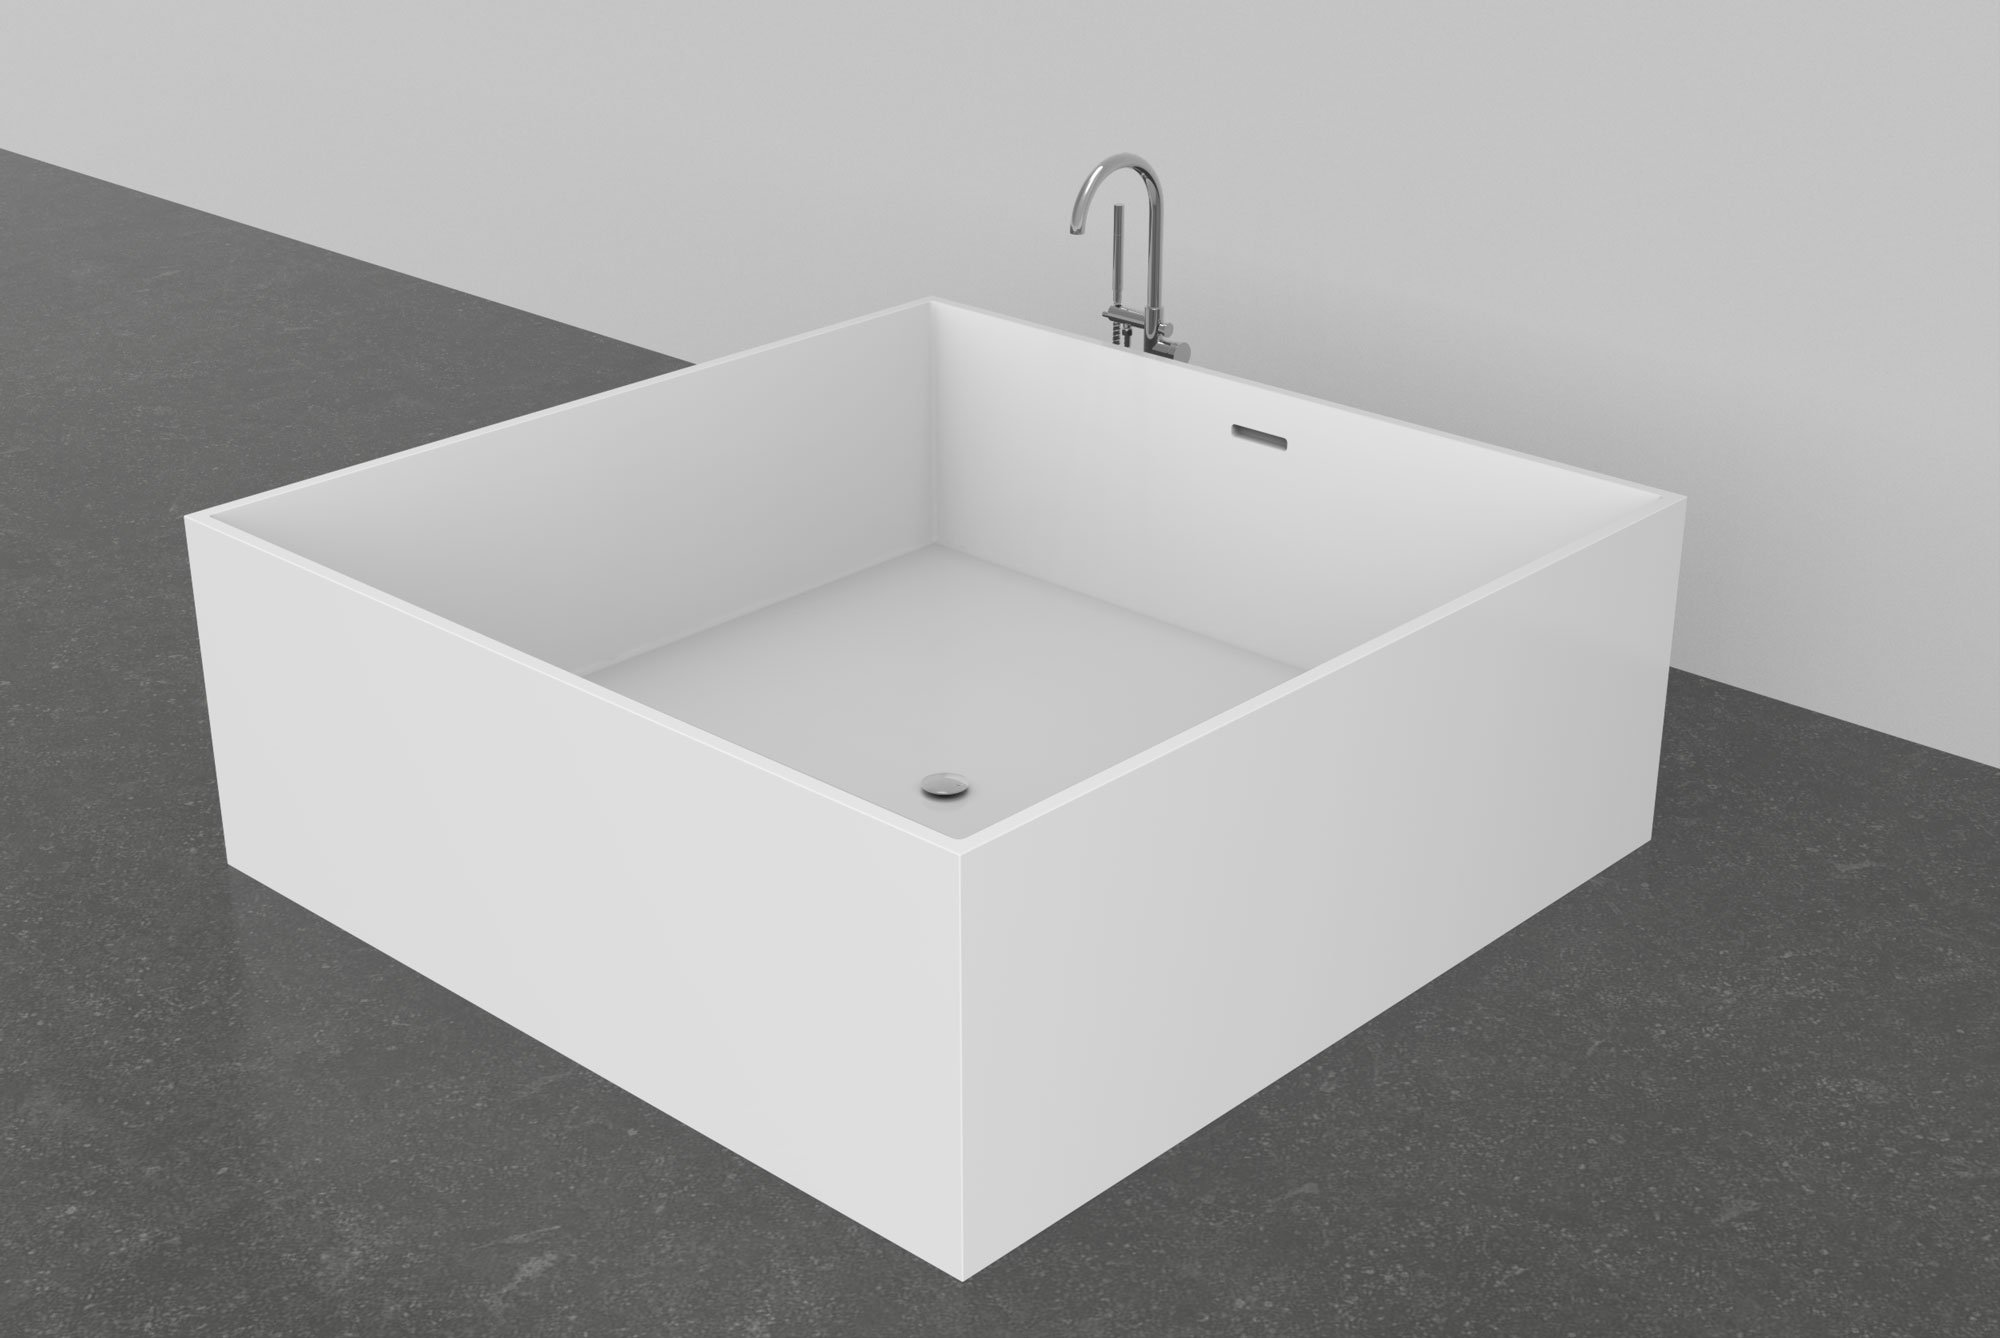 Vasca Da Bagno In Corian Prezzi : Vasche da bagno in corian duraltop